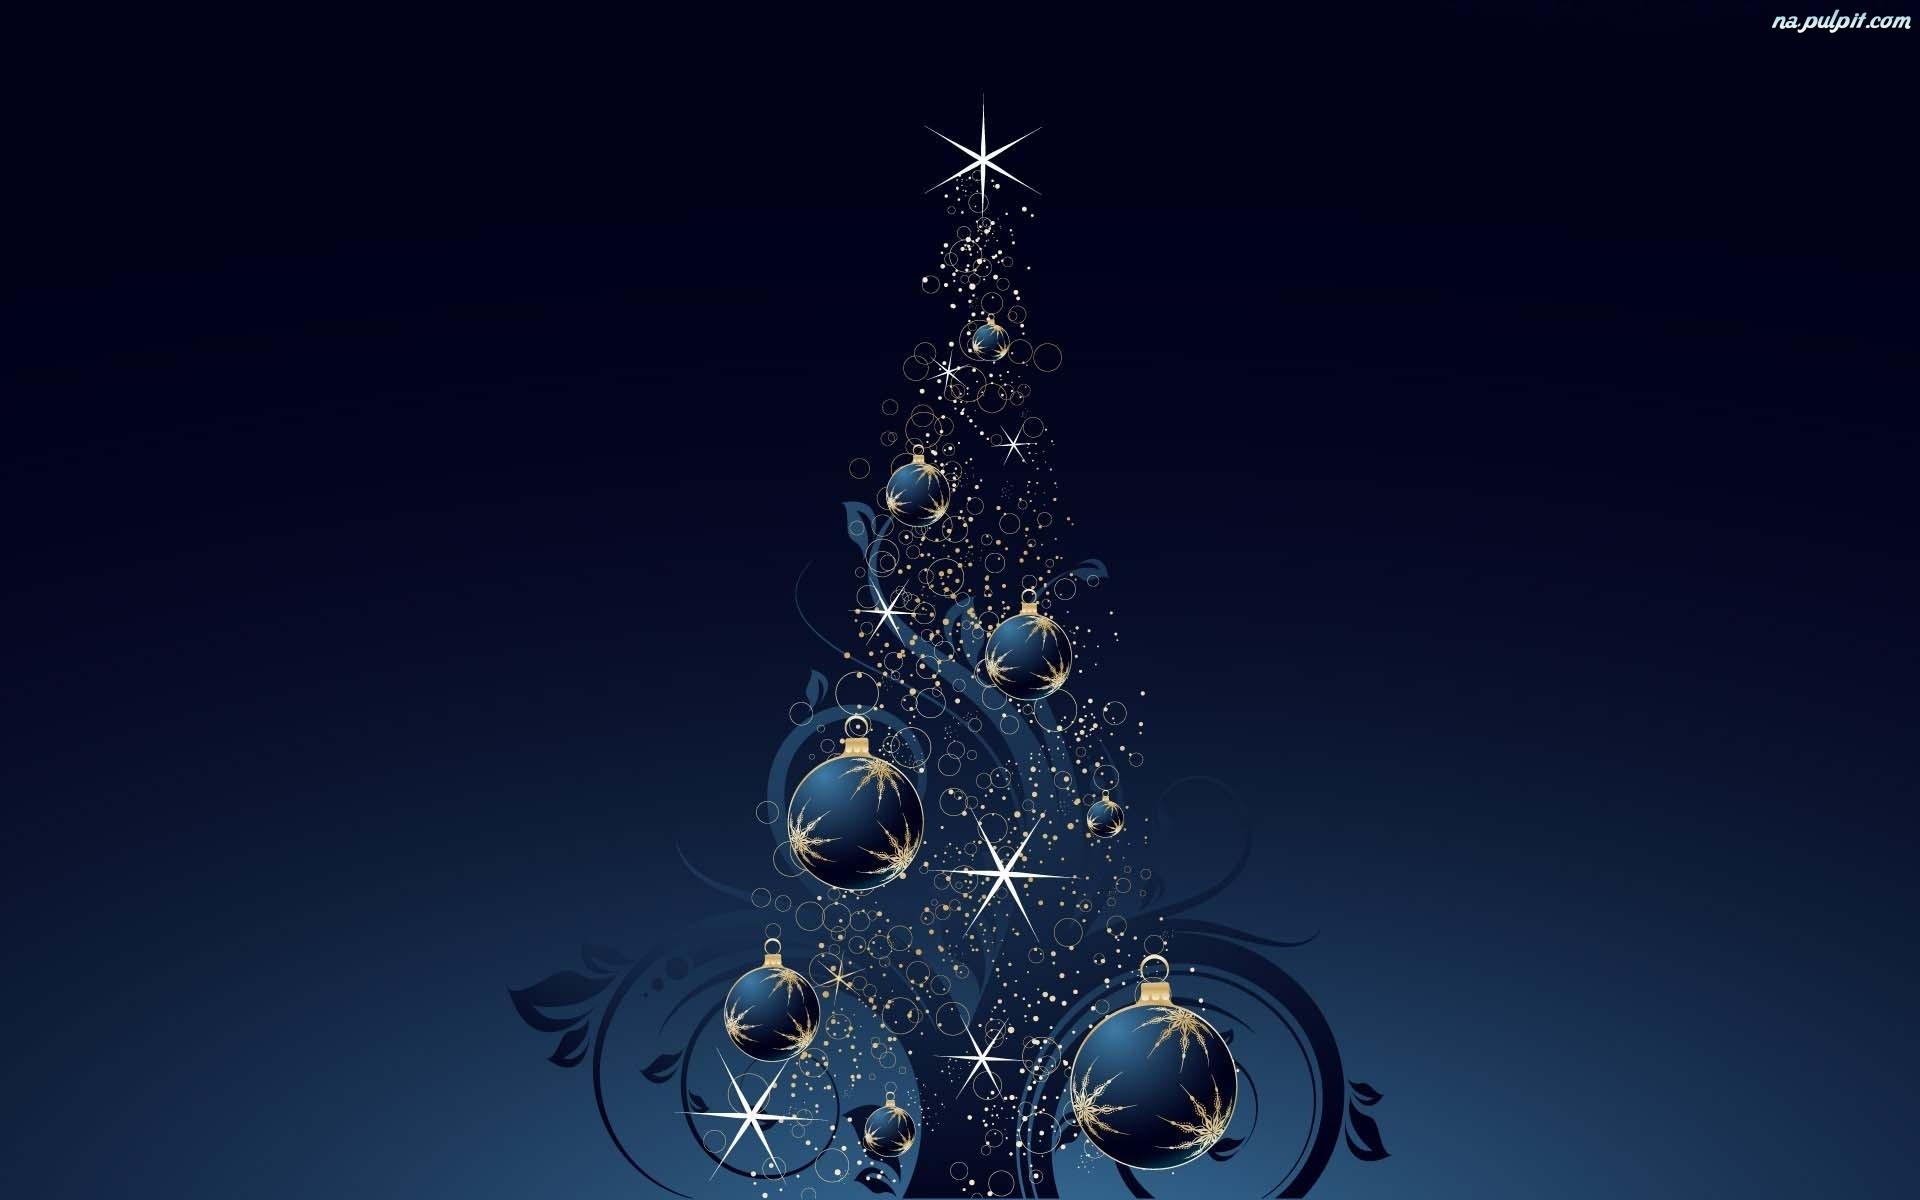 Blue Christmas Tree Forum Avatar: Choinka, Bombki Na Pulpit